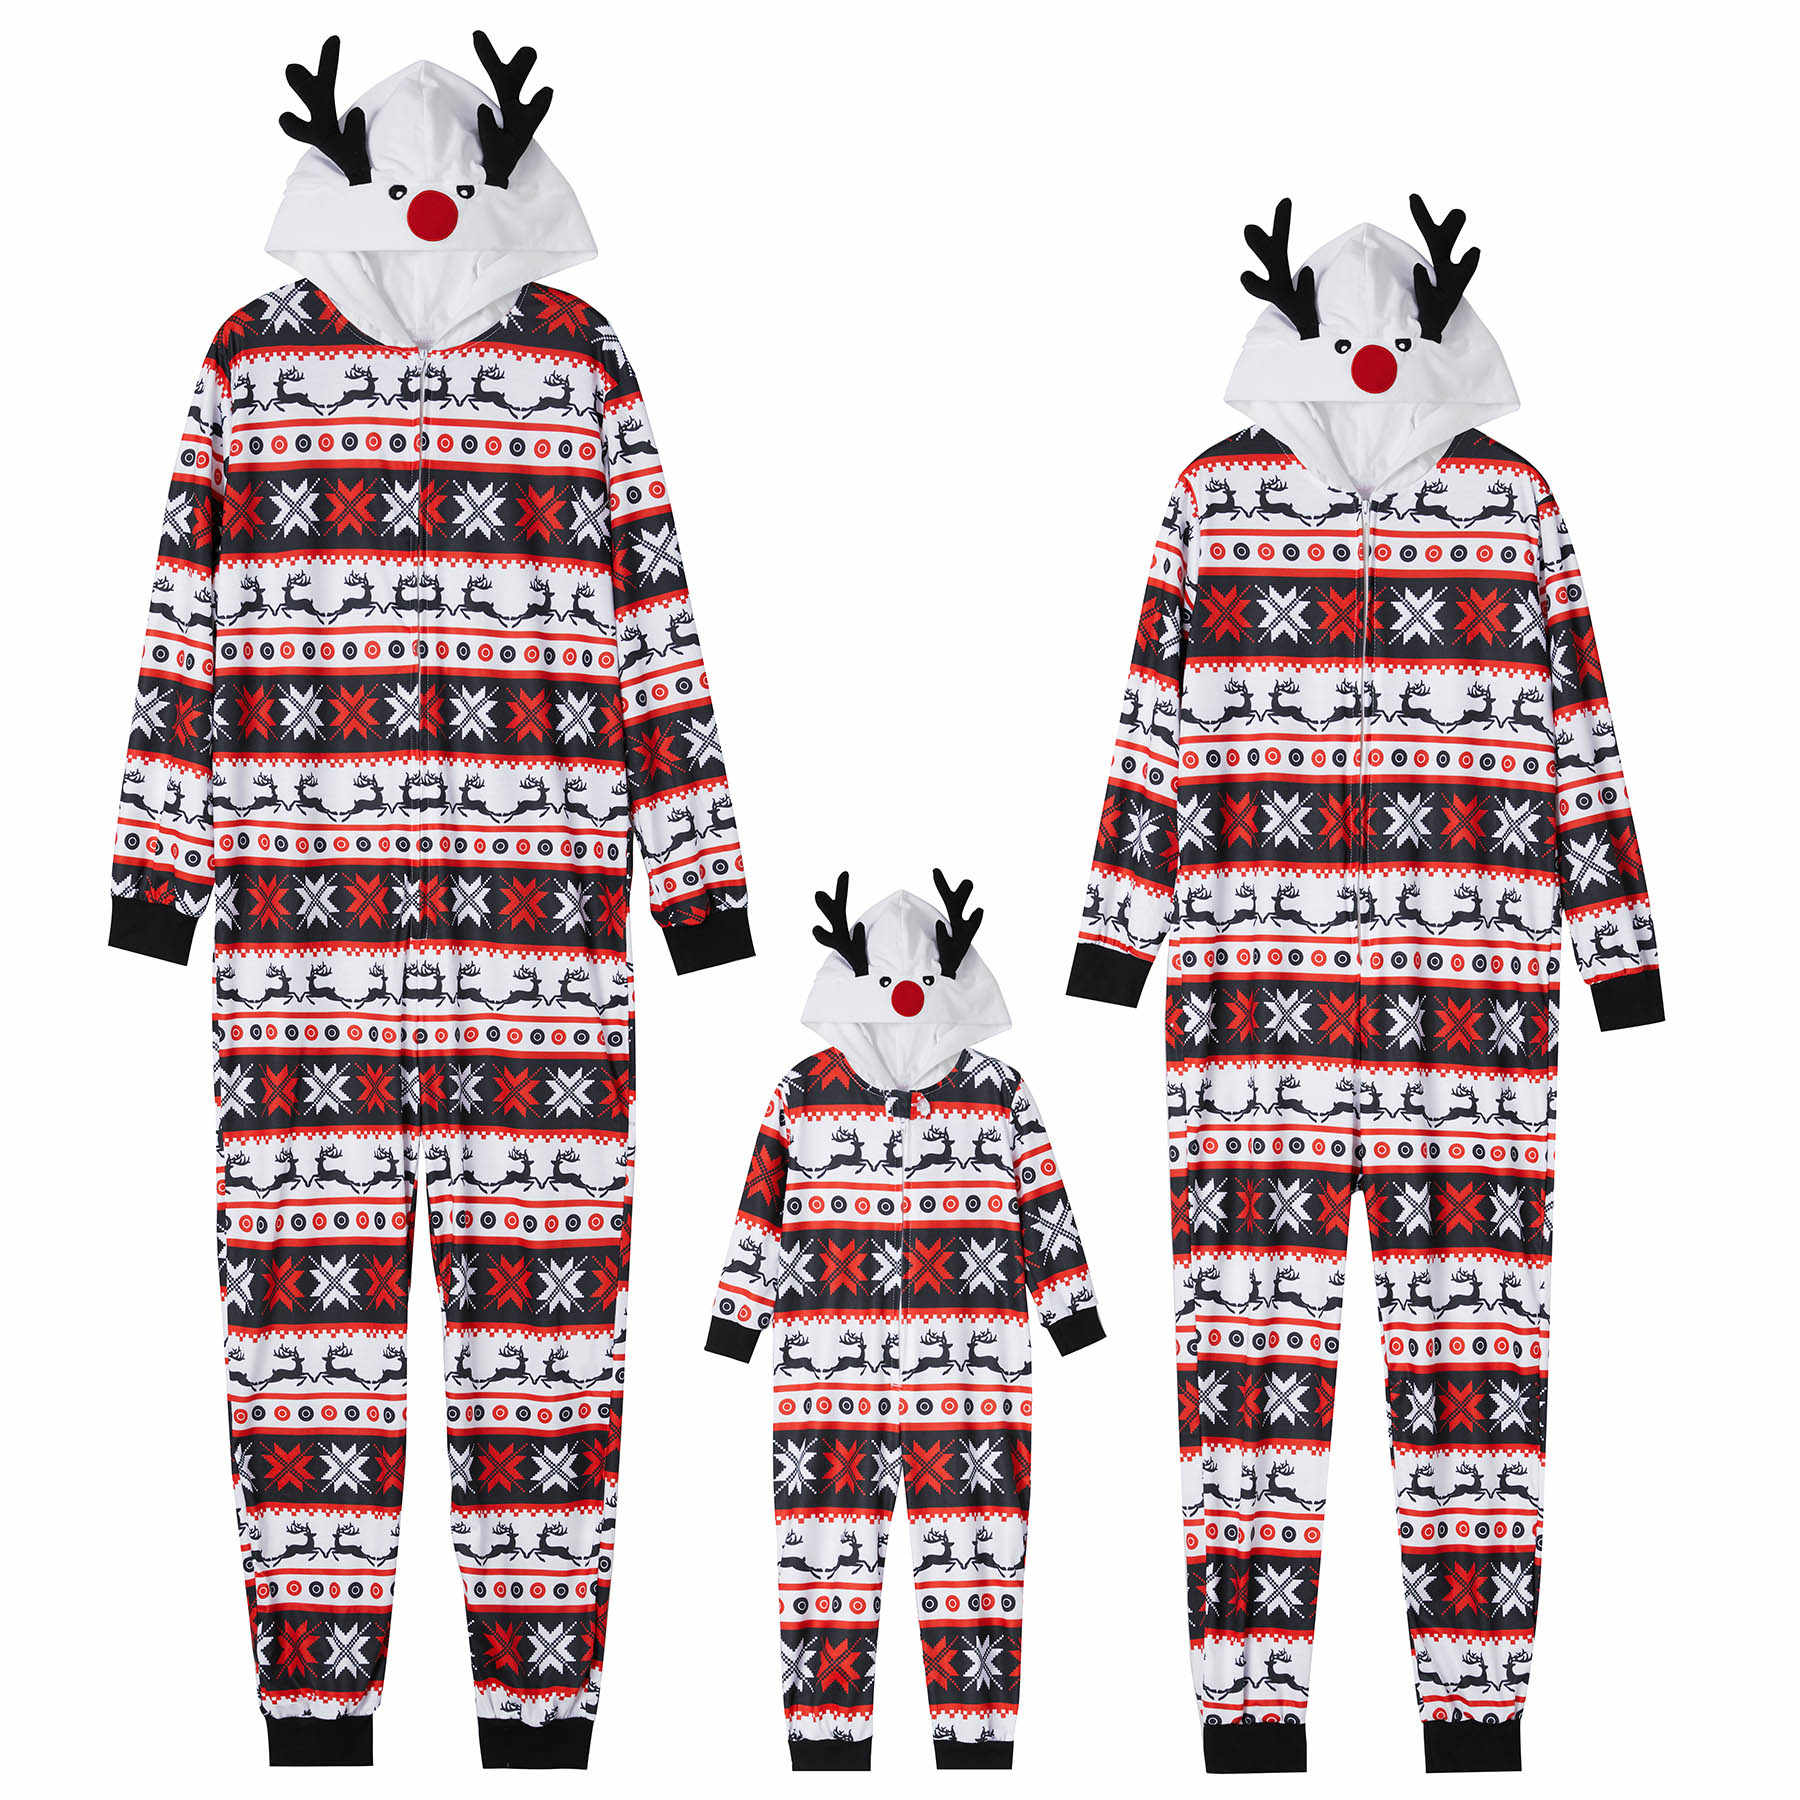 PatPat Family Matching Outfitsคริสต์มาสชุดนอนผ้าฝ้ายชุดนอนReindeer Hoodedการจับคู่ชุดครอบครัวดูชุด